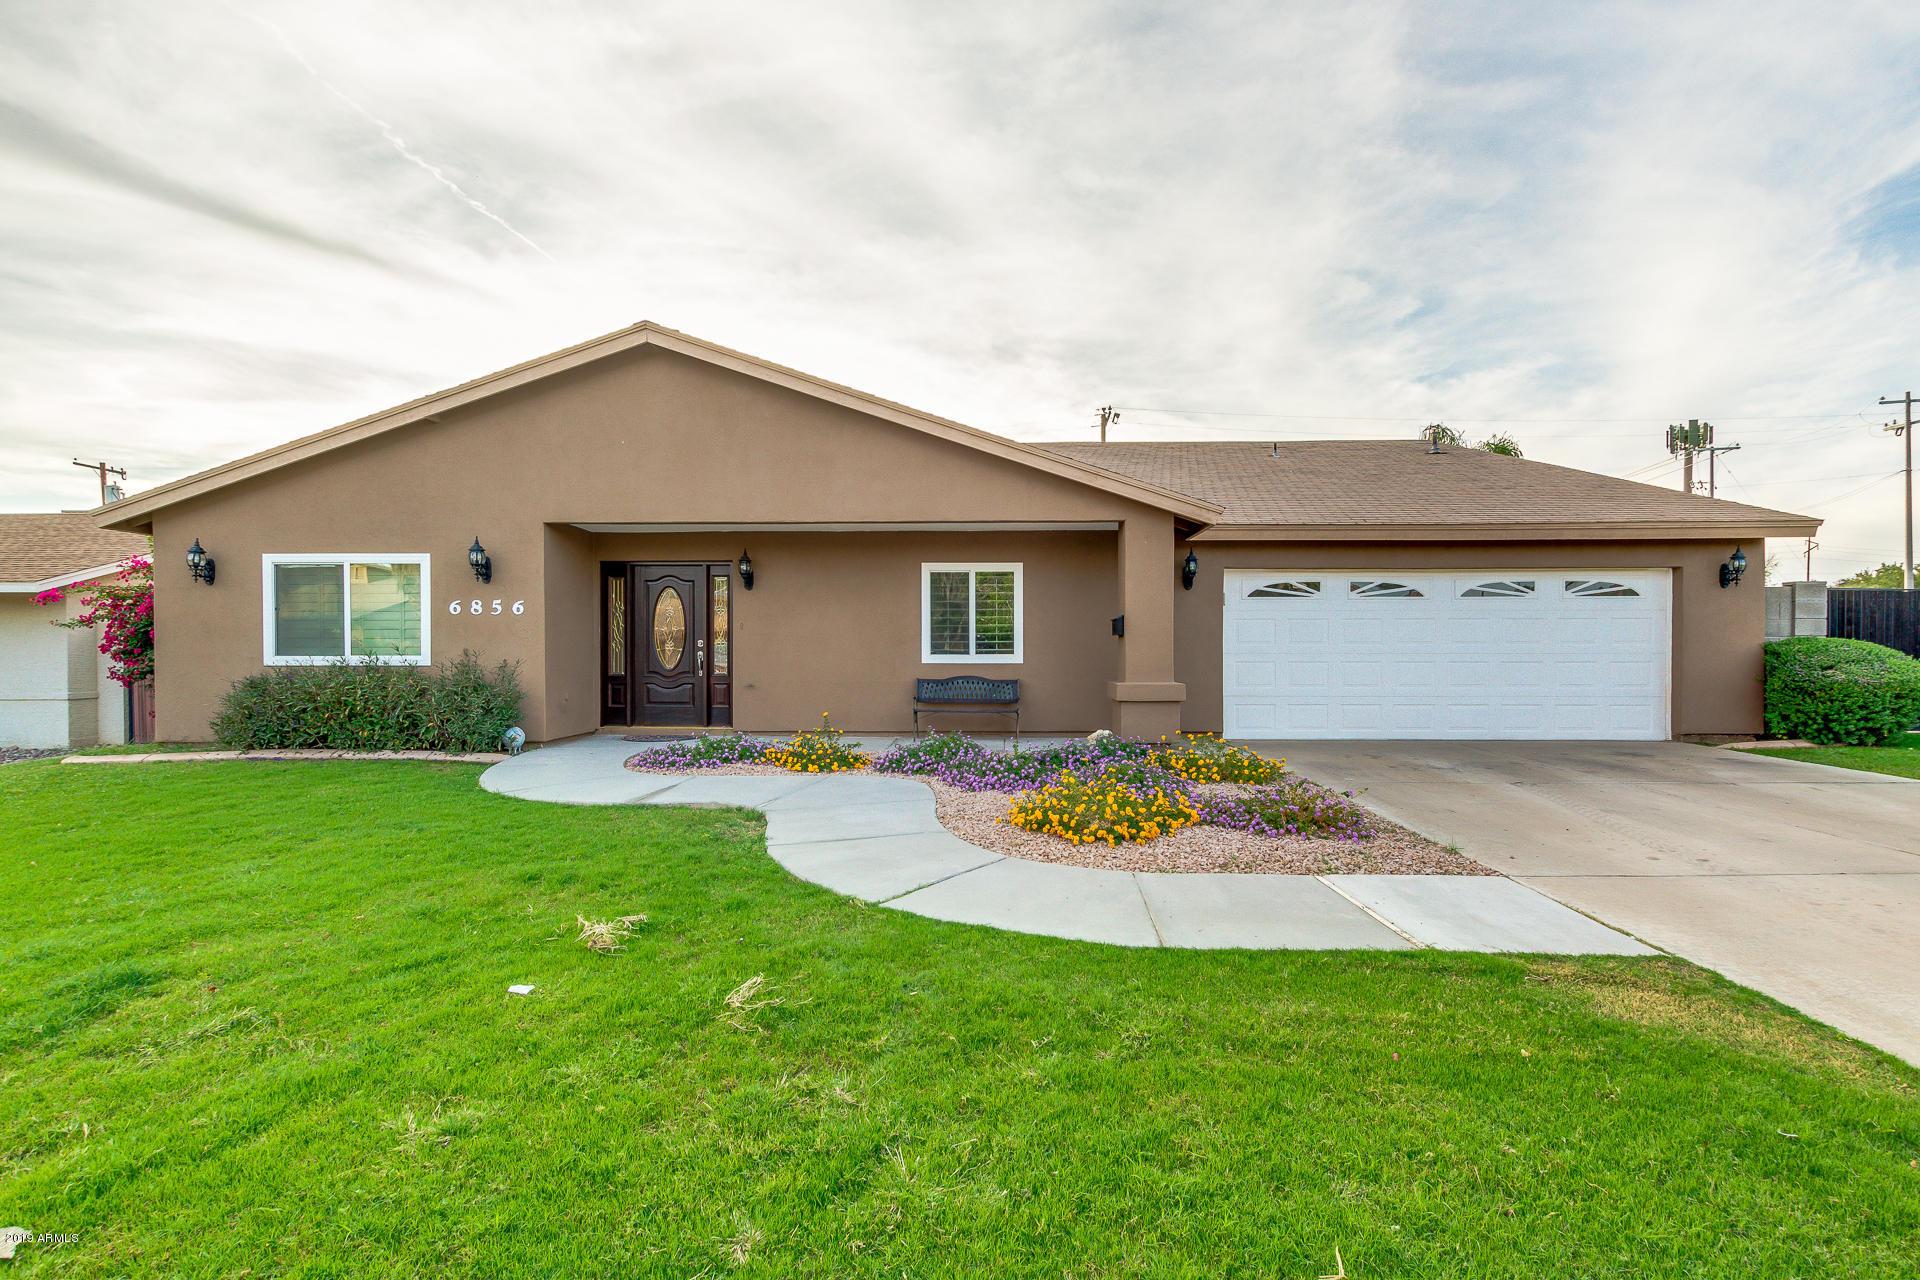 Photo of 6856 N 12TH Way, Phoenix, AZ 85014